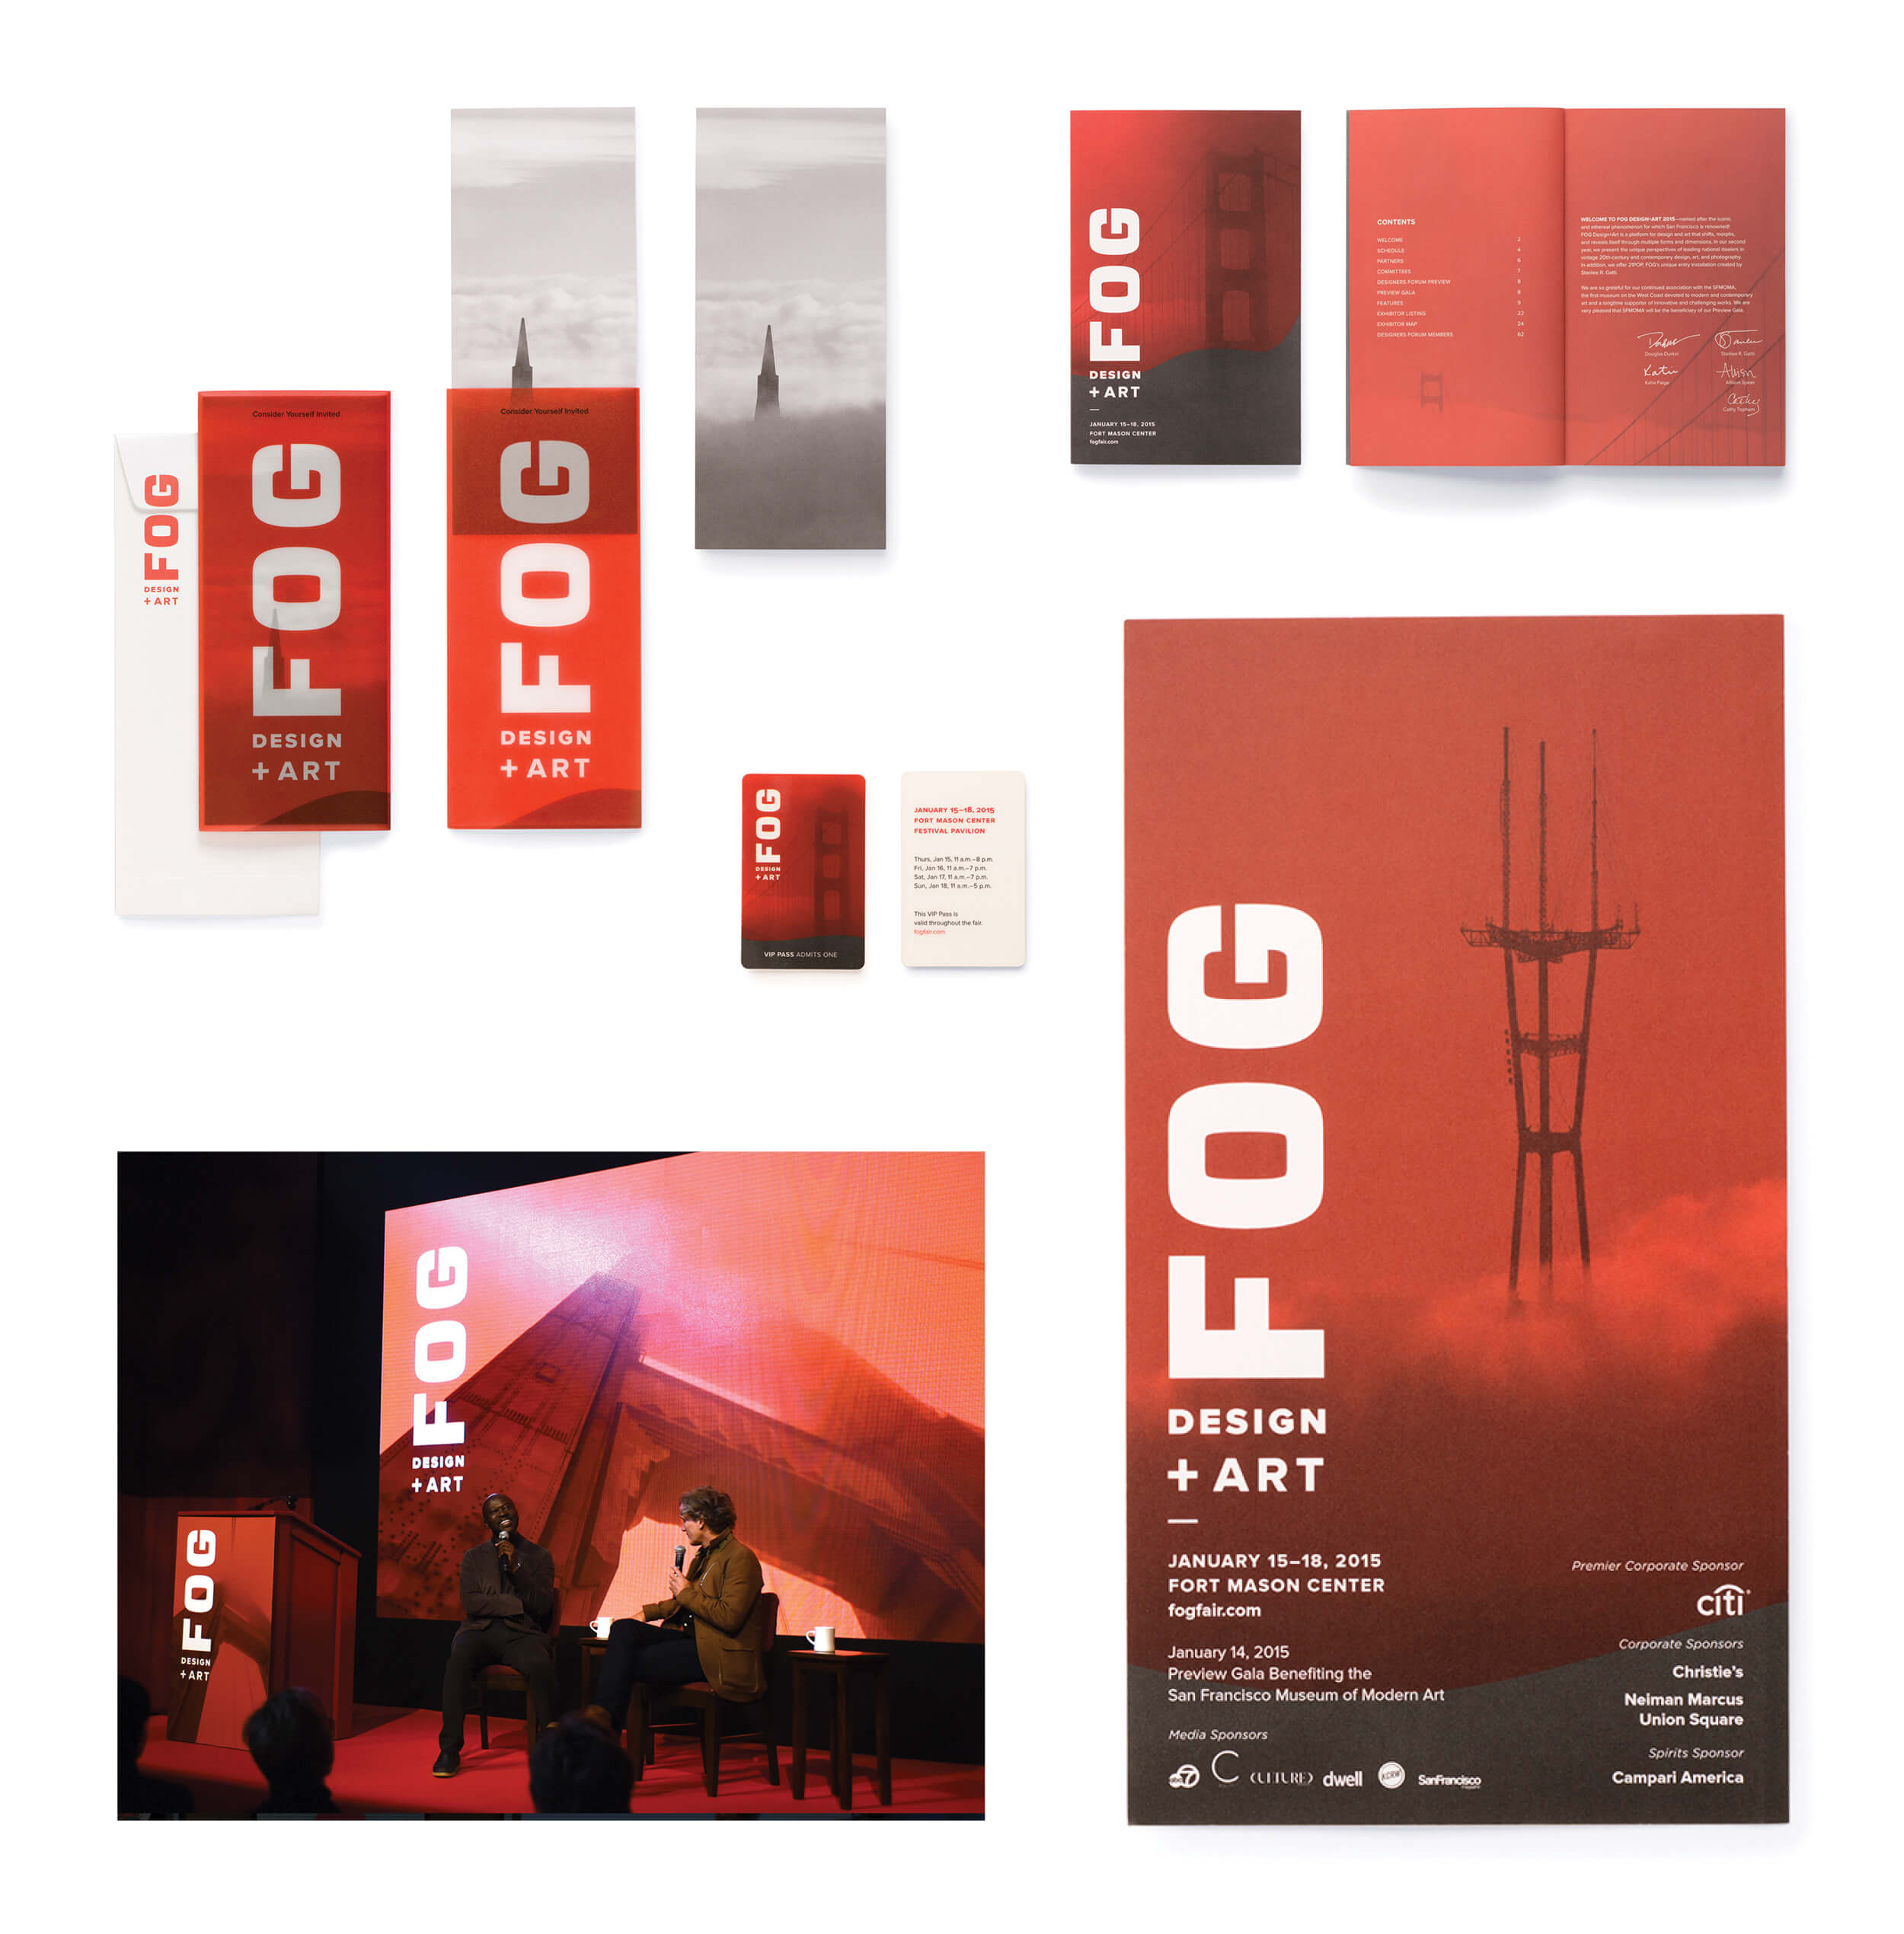 Fog Art Design Fair invitation print and digital collateral